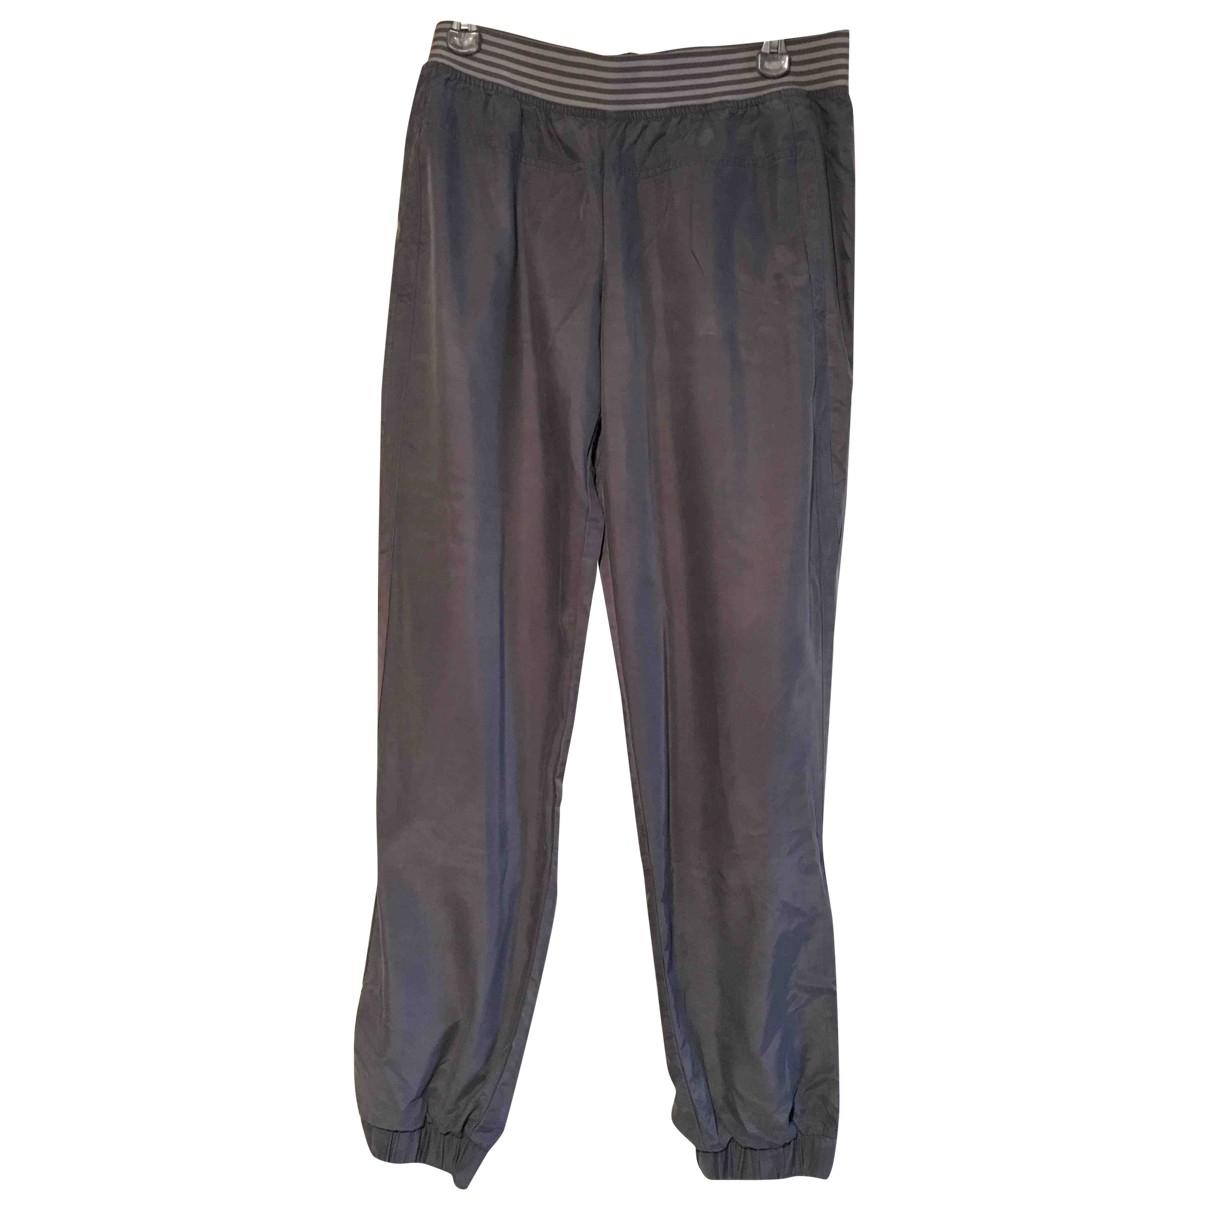 Pantalon en Poliester Antracita Stella Mccartney Pour Adidas